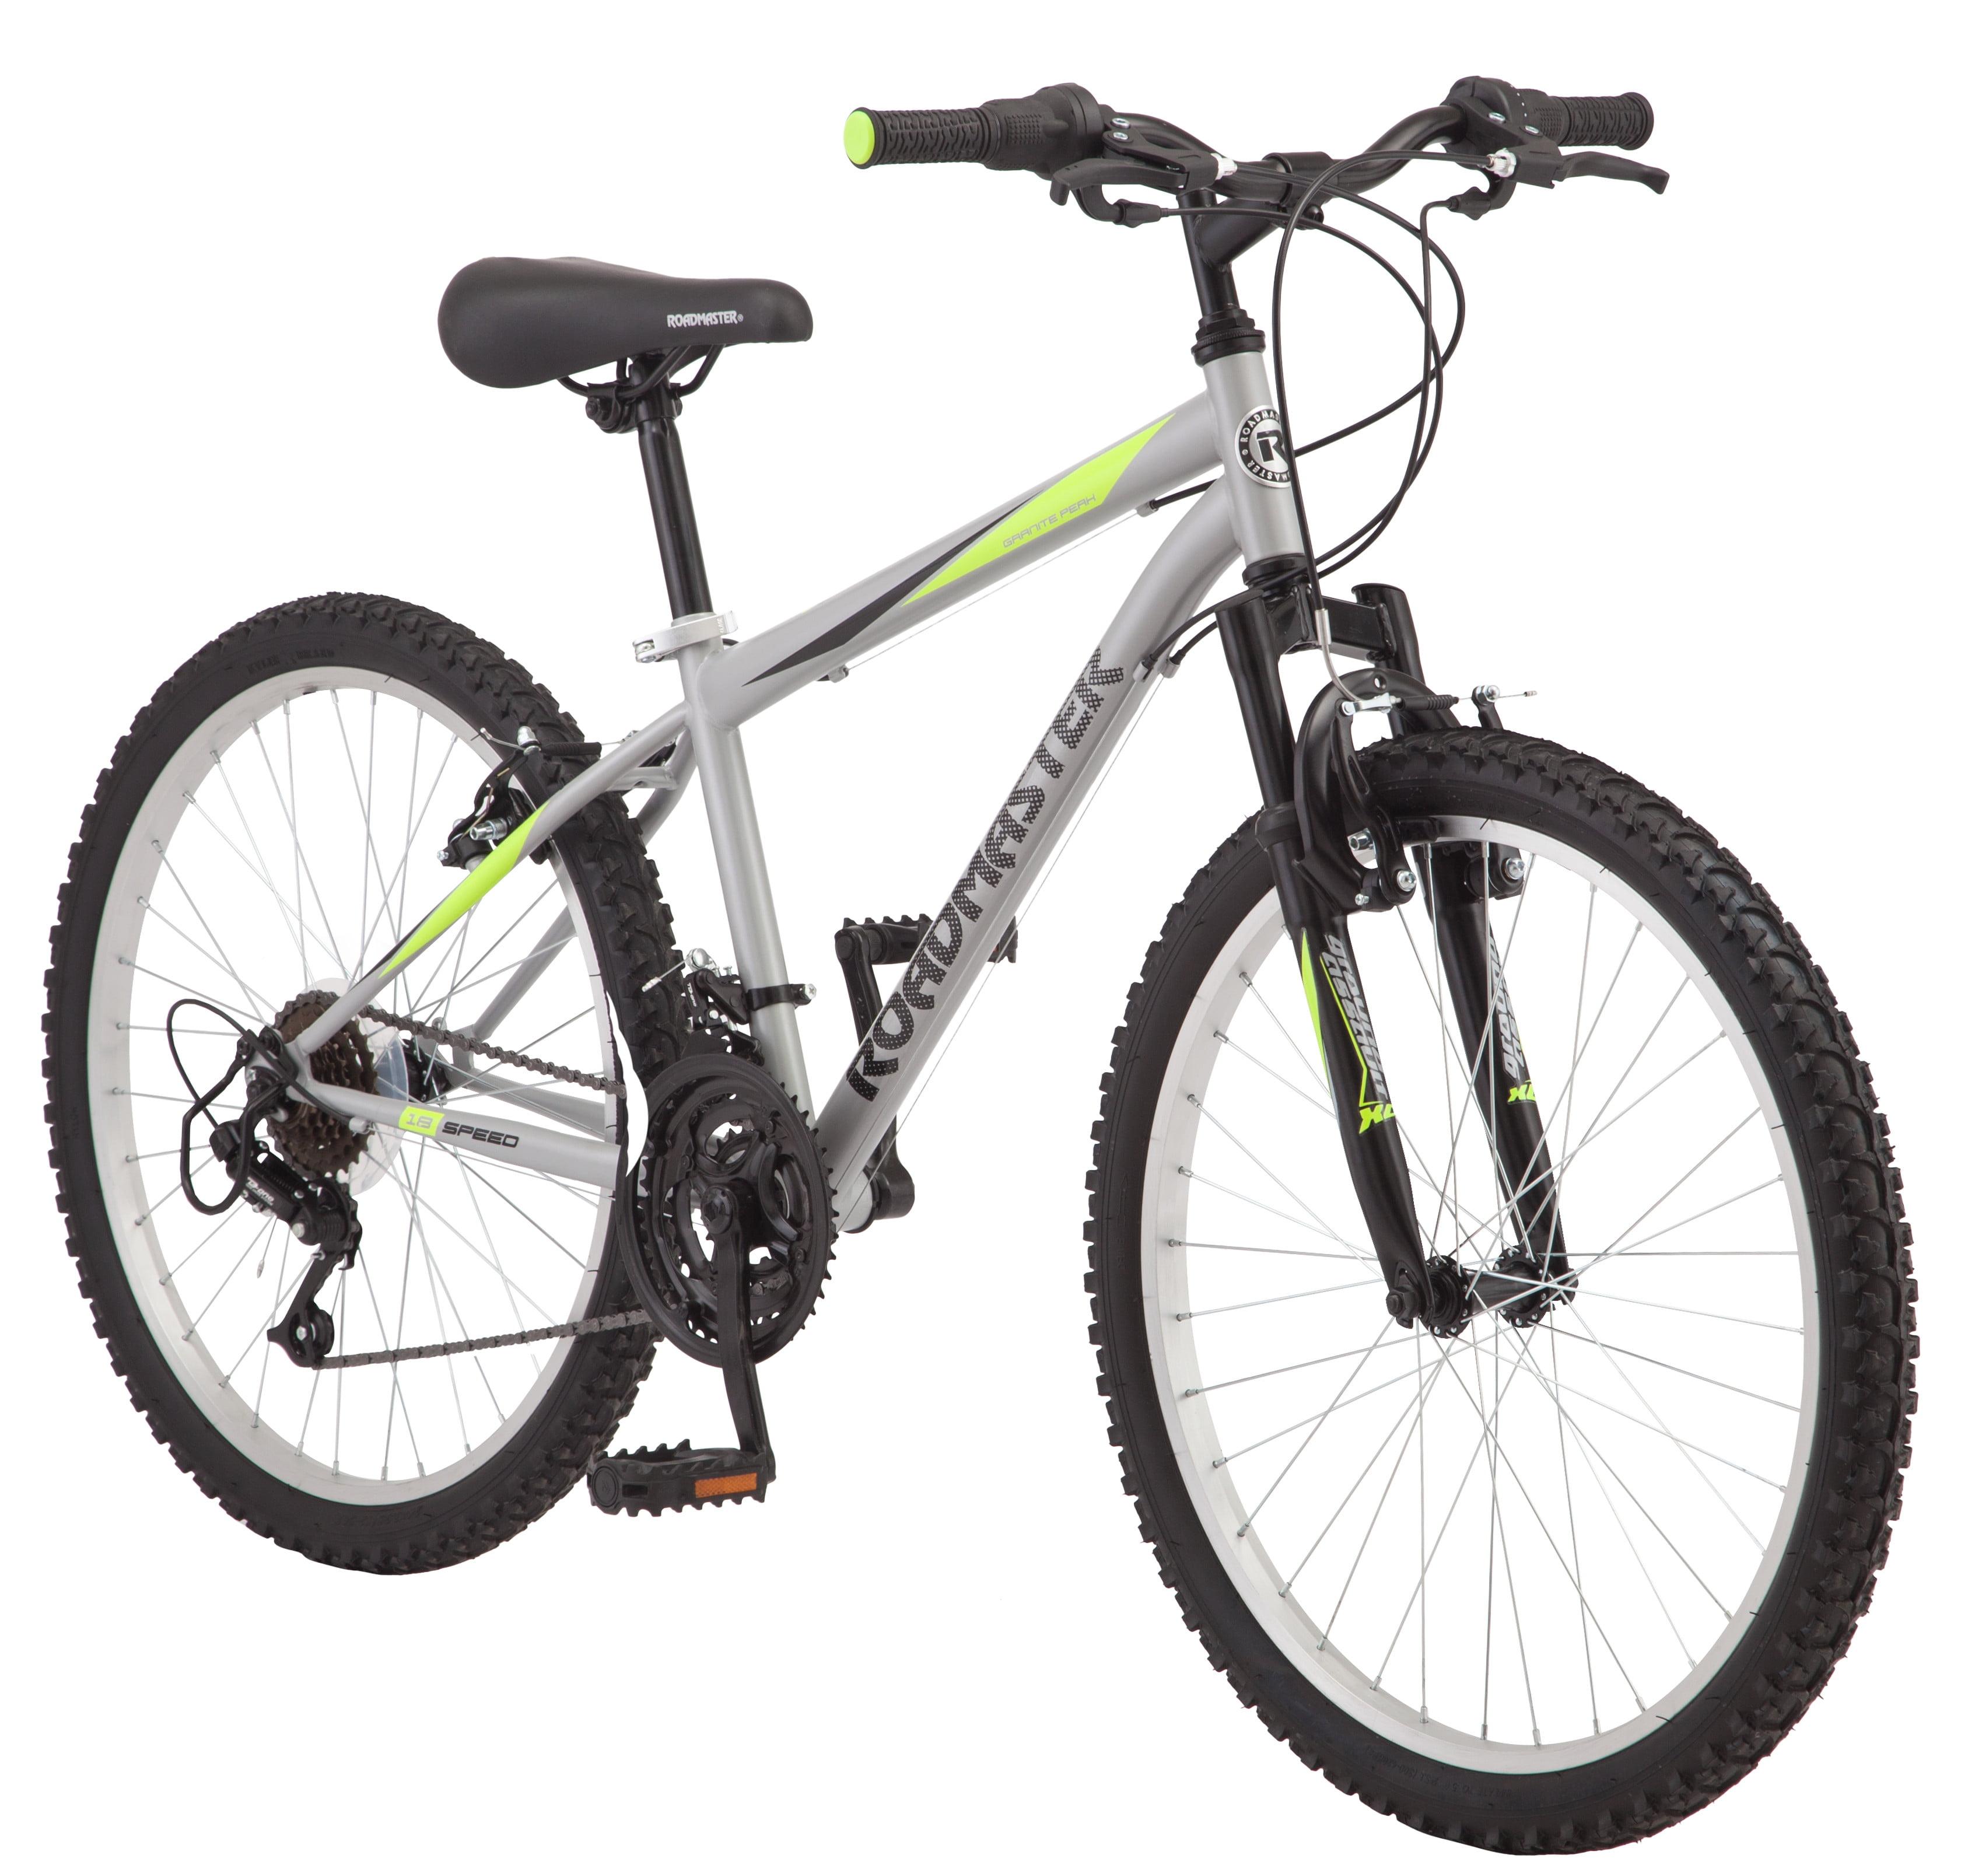 "Roadmaster 24"" Granite Peak Boy's Mountain Bike, Silver by Pacific Cycle"